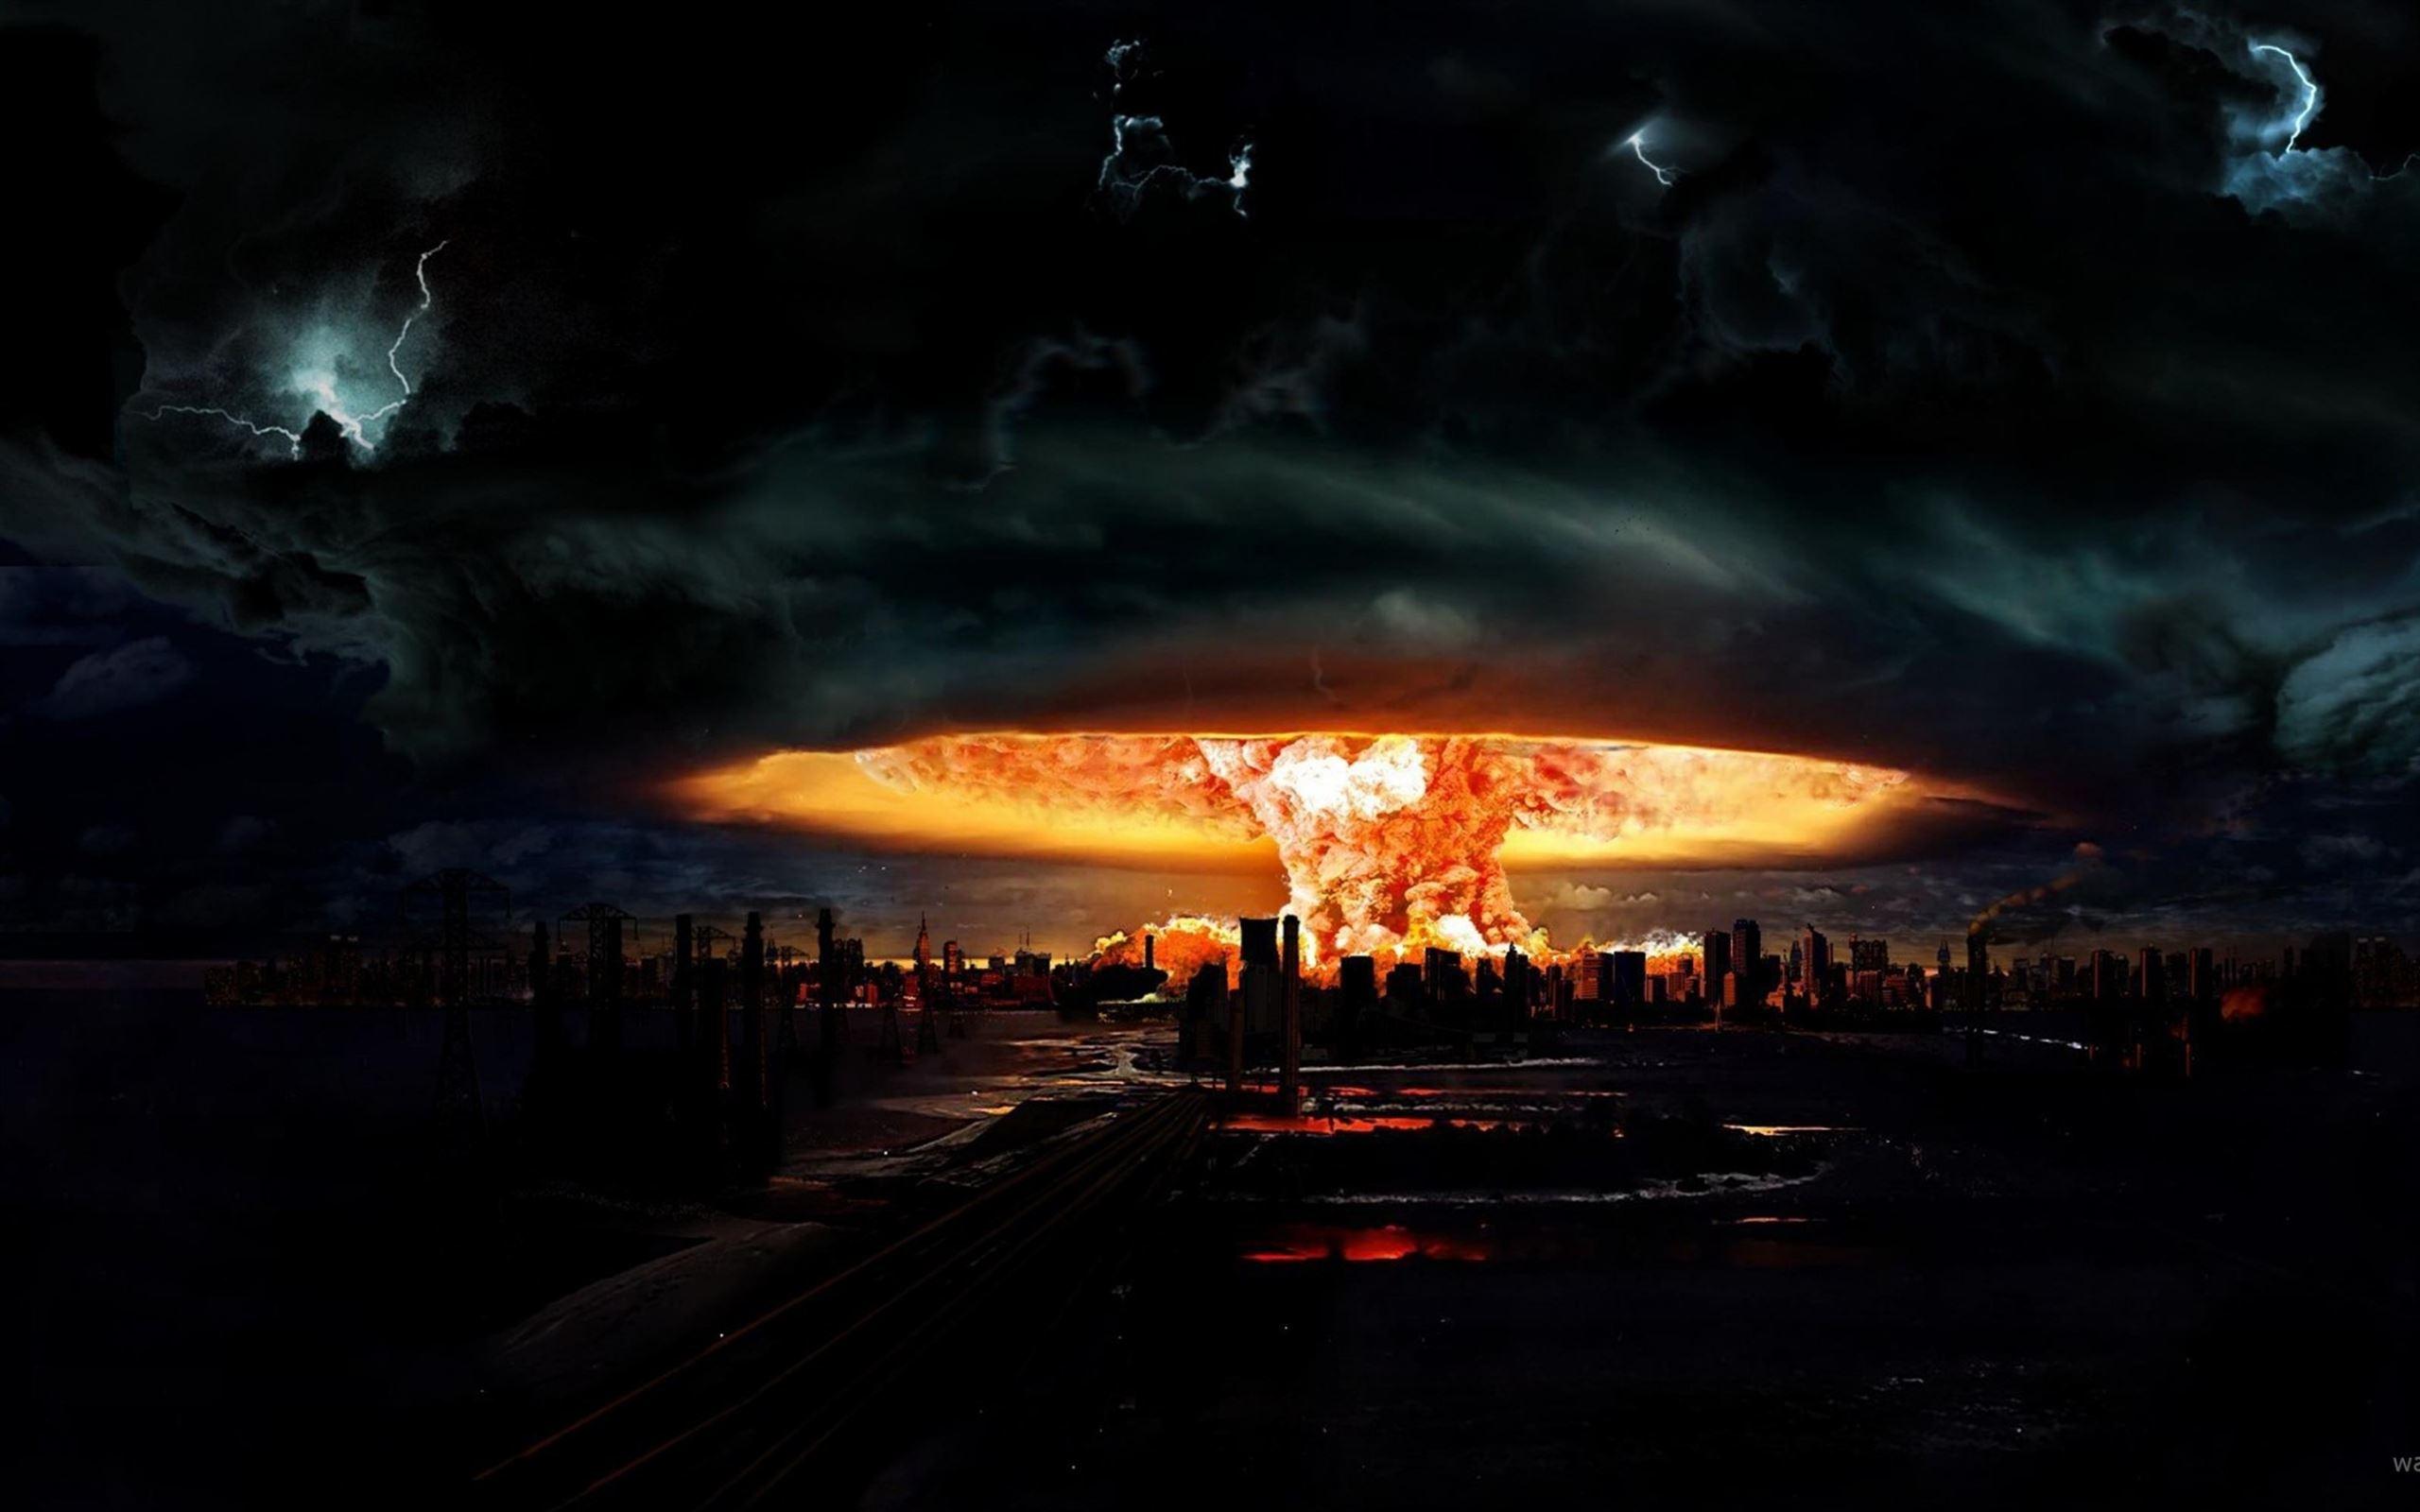 Orange Wallpaper Iphone Nuclear Explosion Of Darkness Mac Wallpaper Download